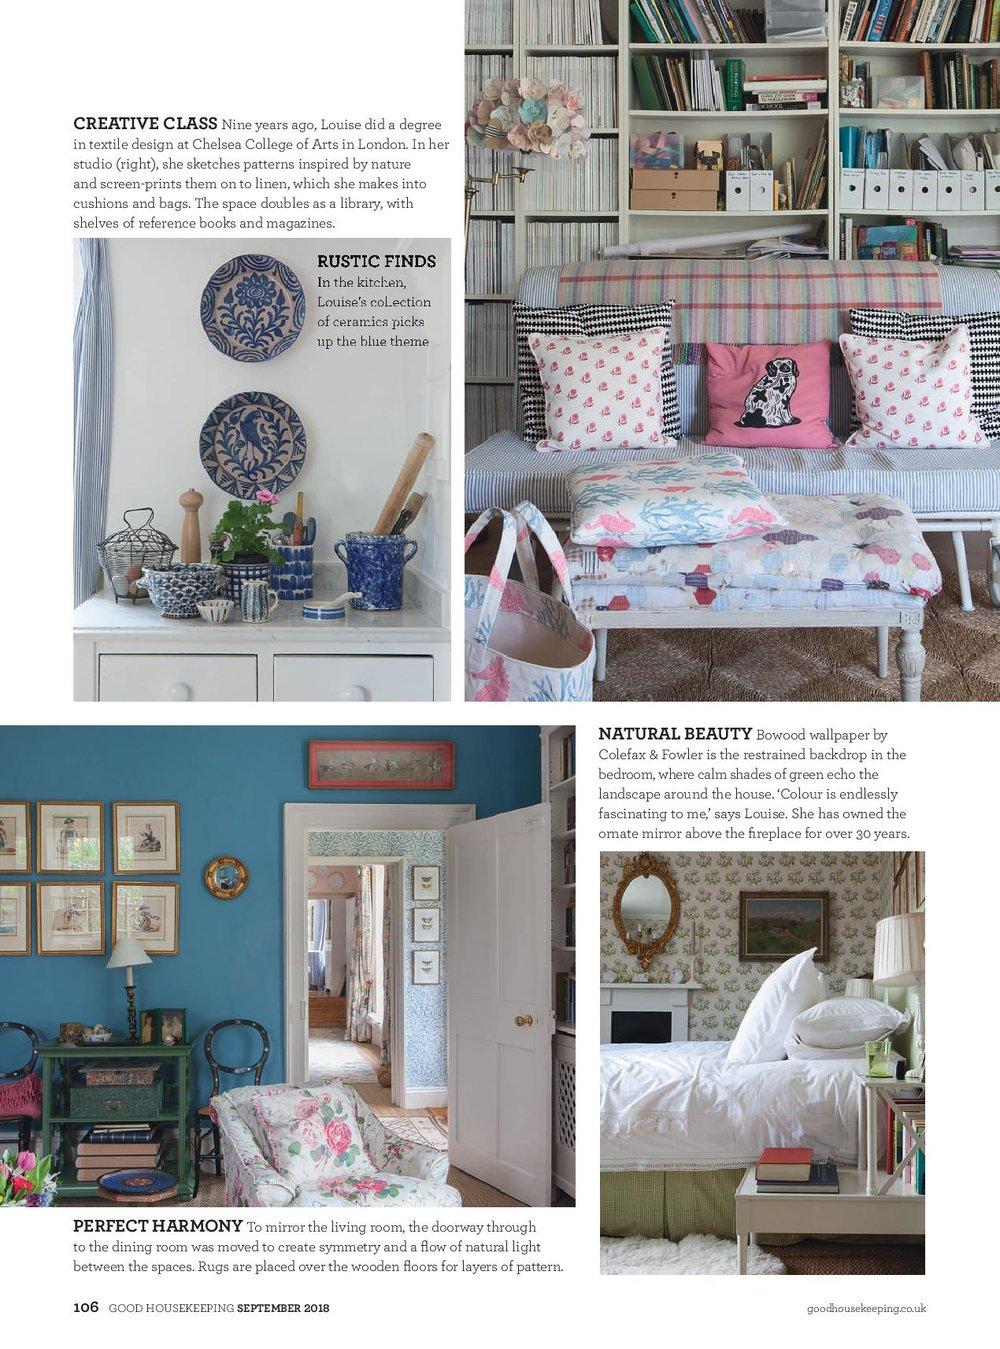 Homes - house V2_pdf_zinio_4 (1)-page-001.jpg